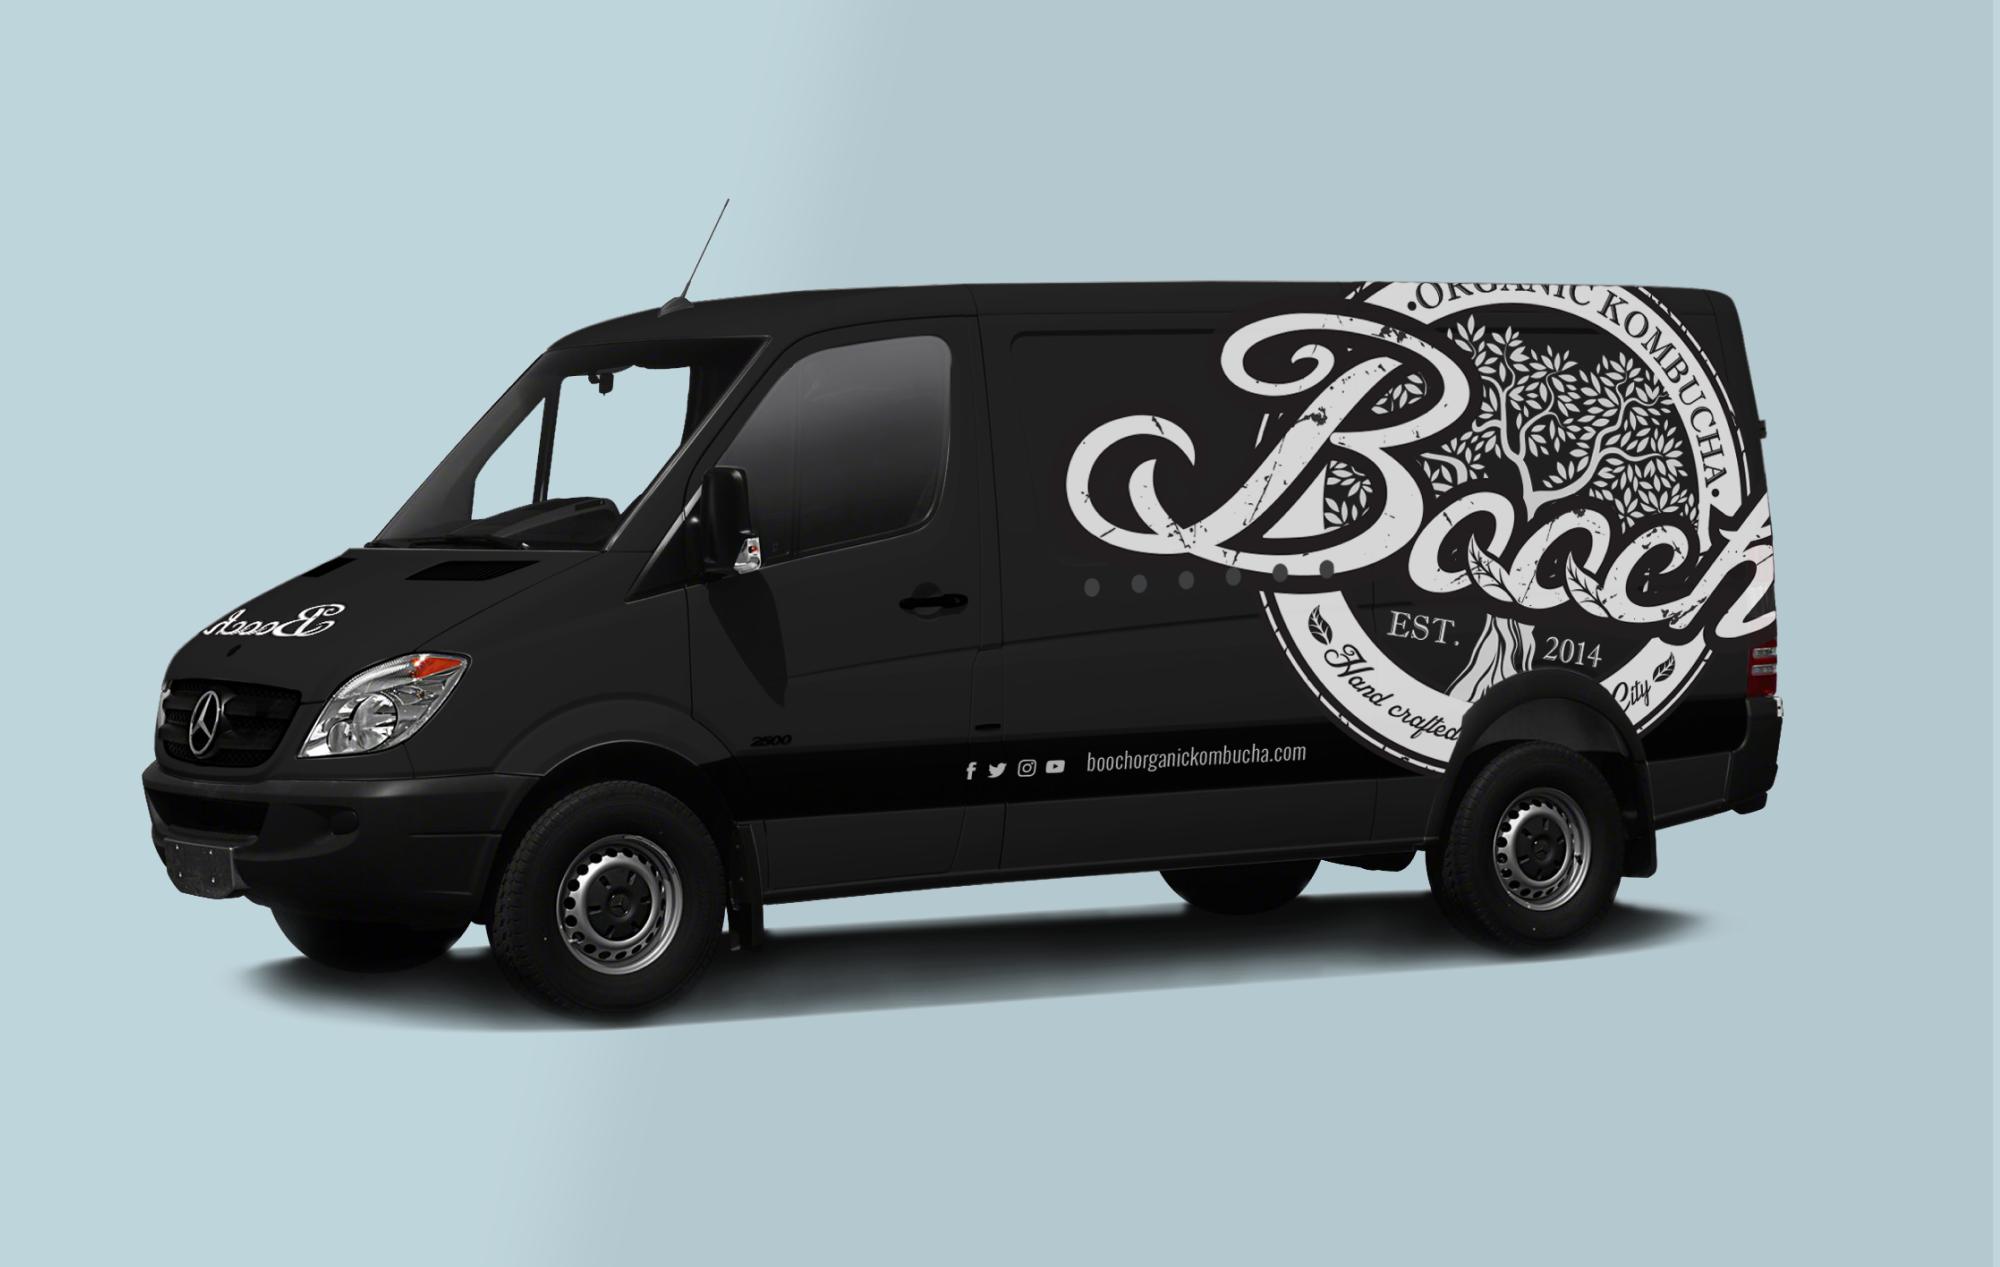 Black van with white Booch logo